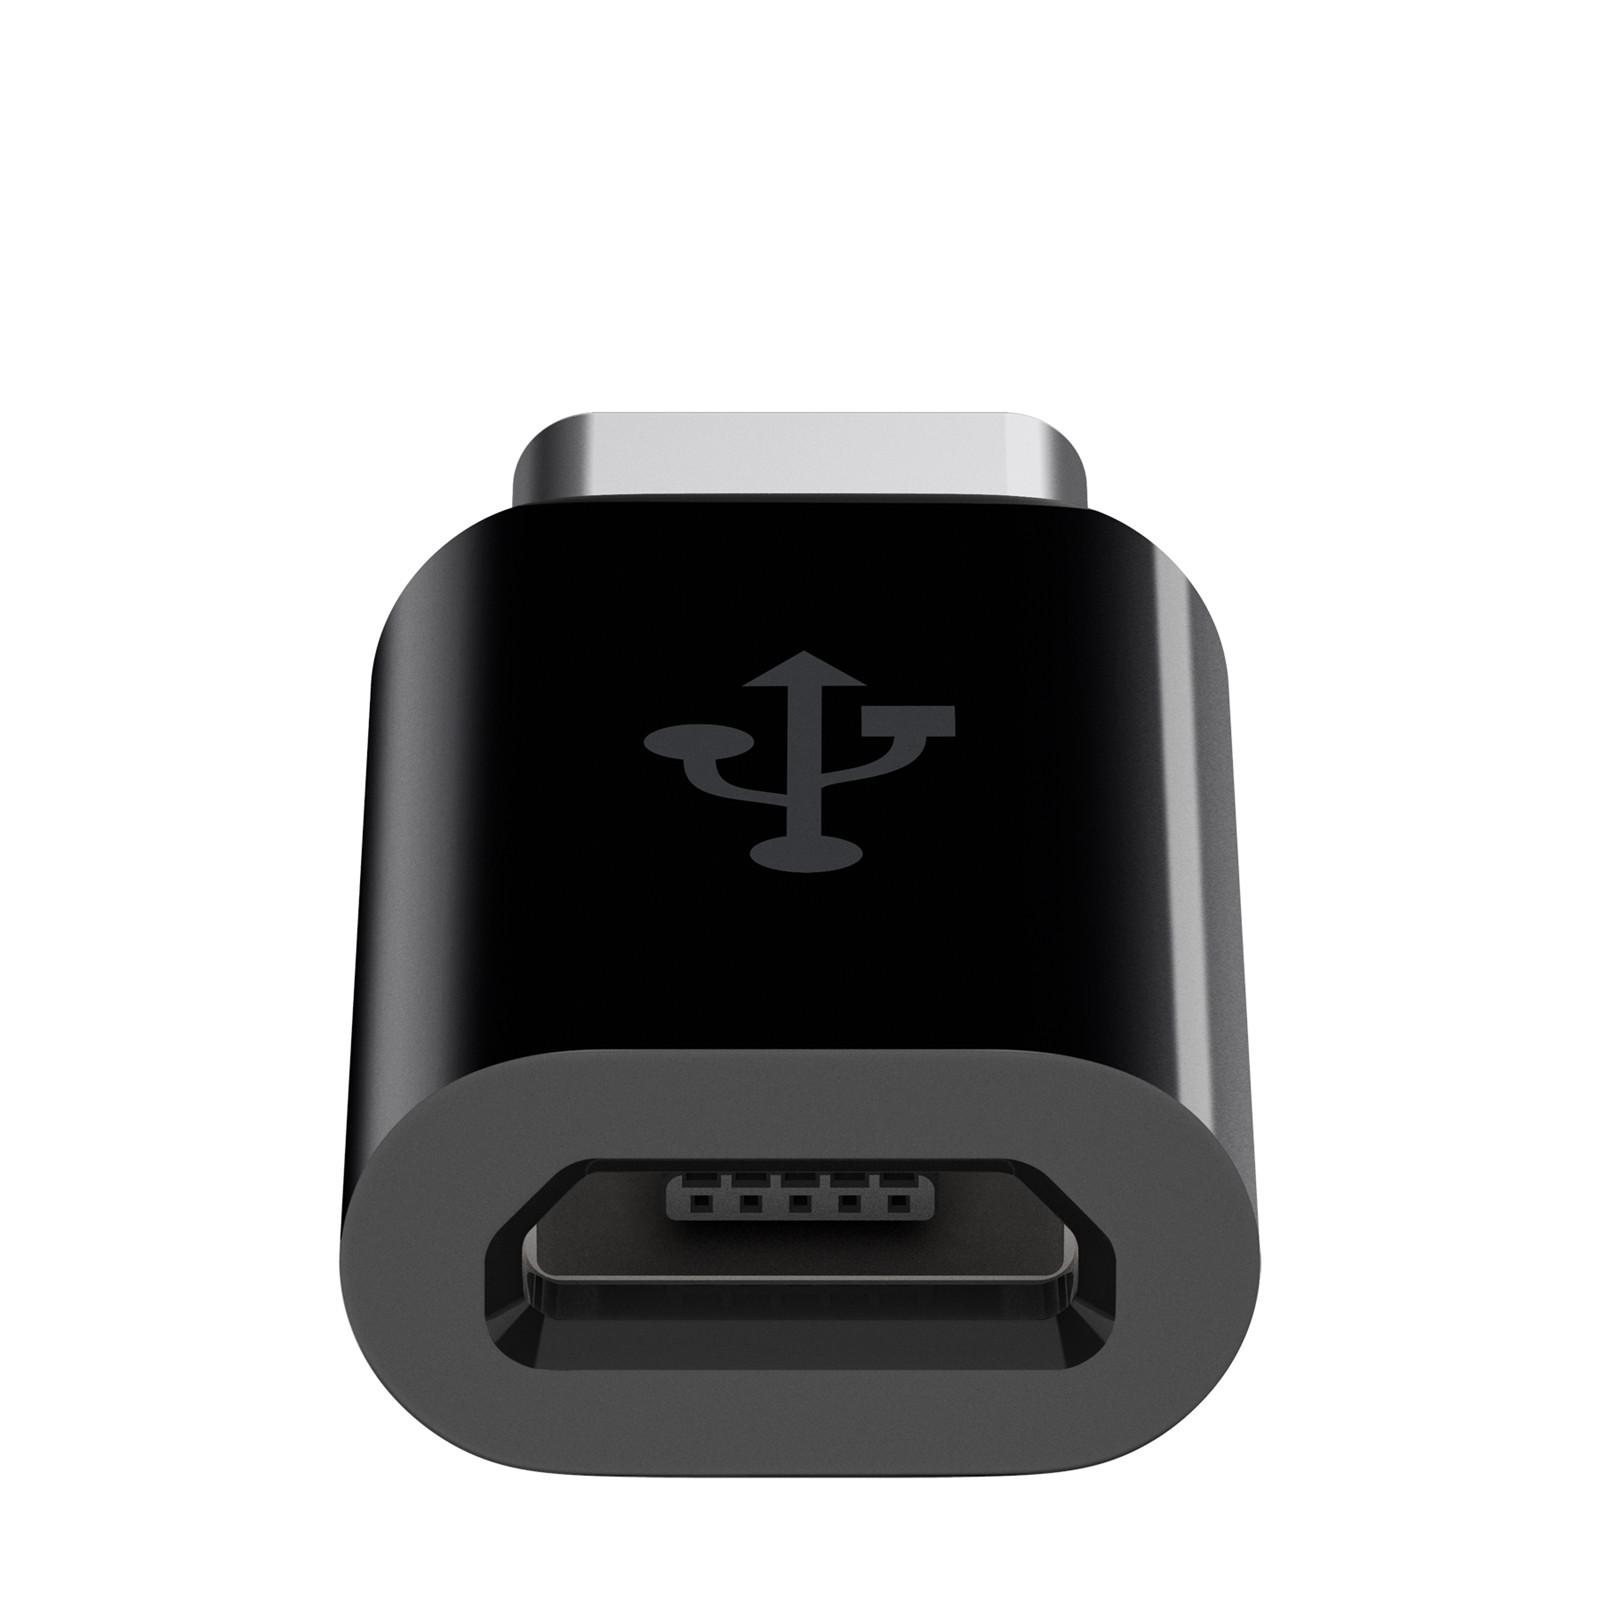 Buy The Belkin Usb C To Micro Adapter Convert Your Xiaomi 31 Type Converter Original Cable